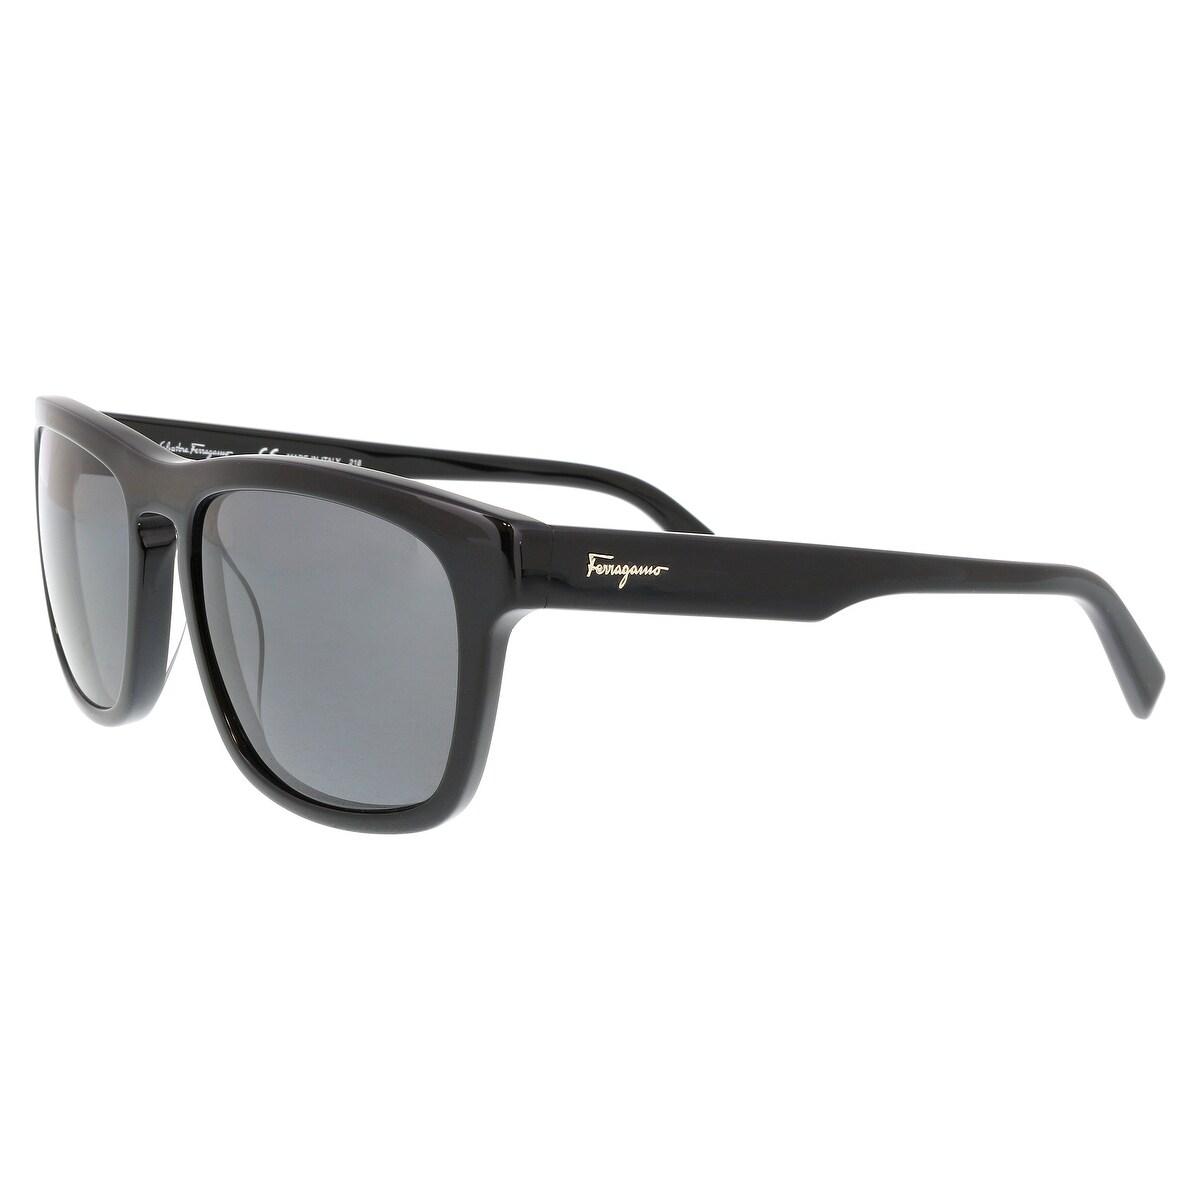 f2adf9c930b Shop Salvatore Ferragamo SF789 SP 001 Black Rectangle Sunglasses ...